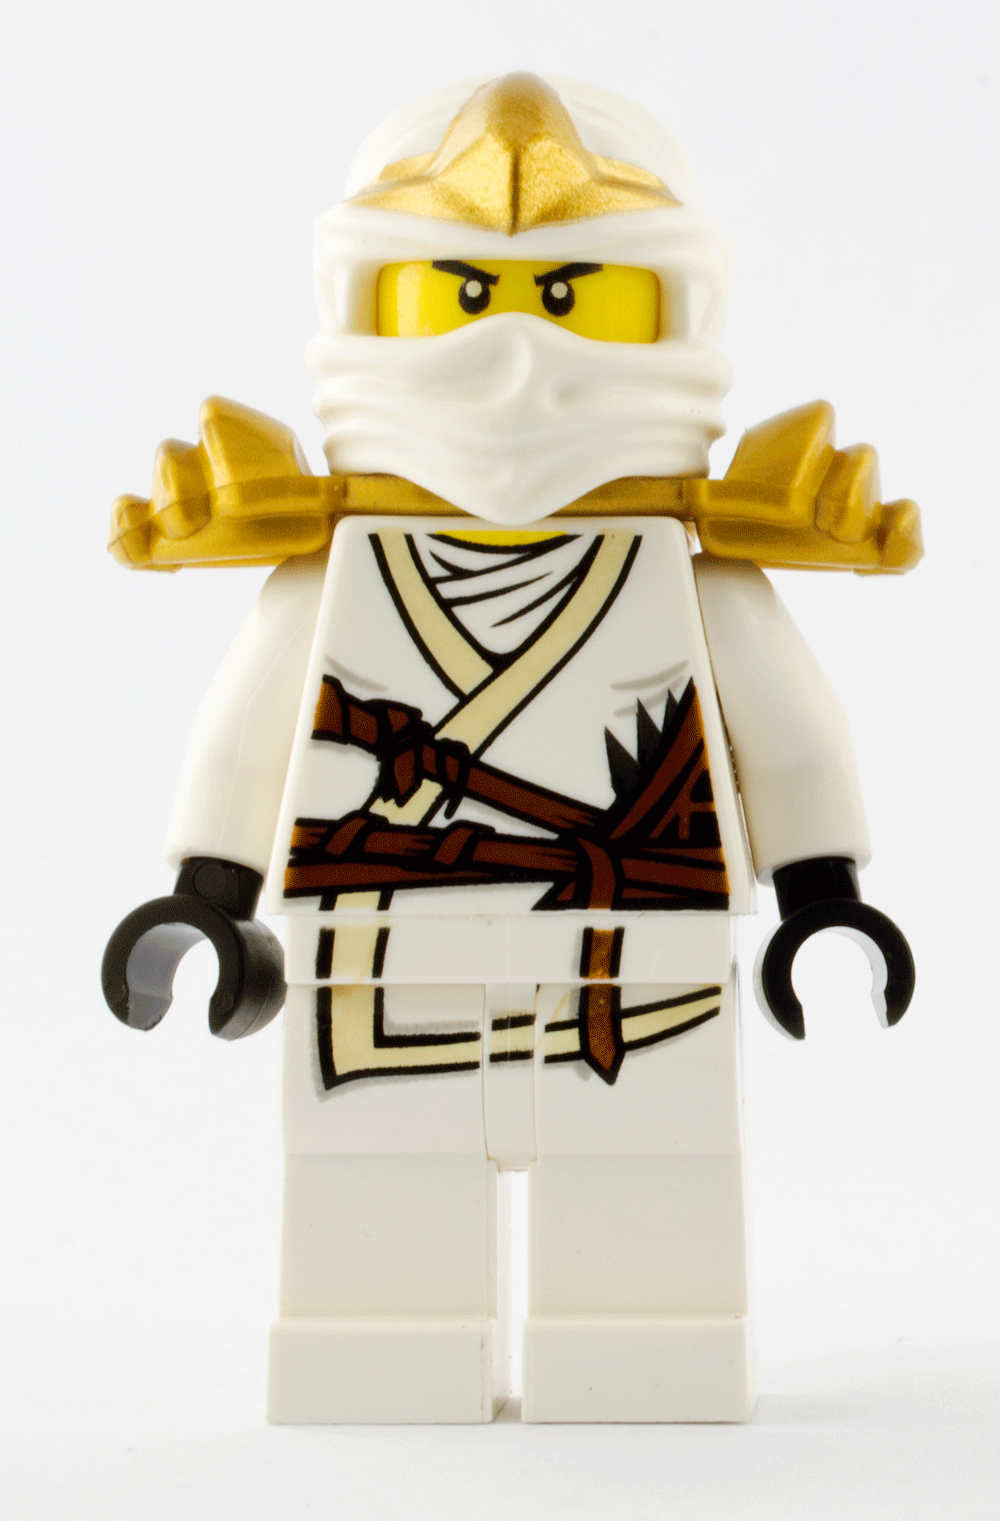 Zane brickipedia the lego wiki - Ninjago lego zane ...